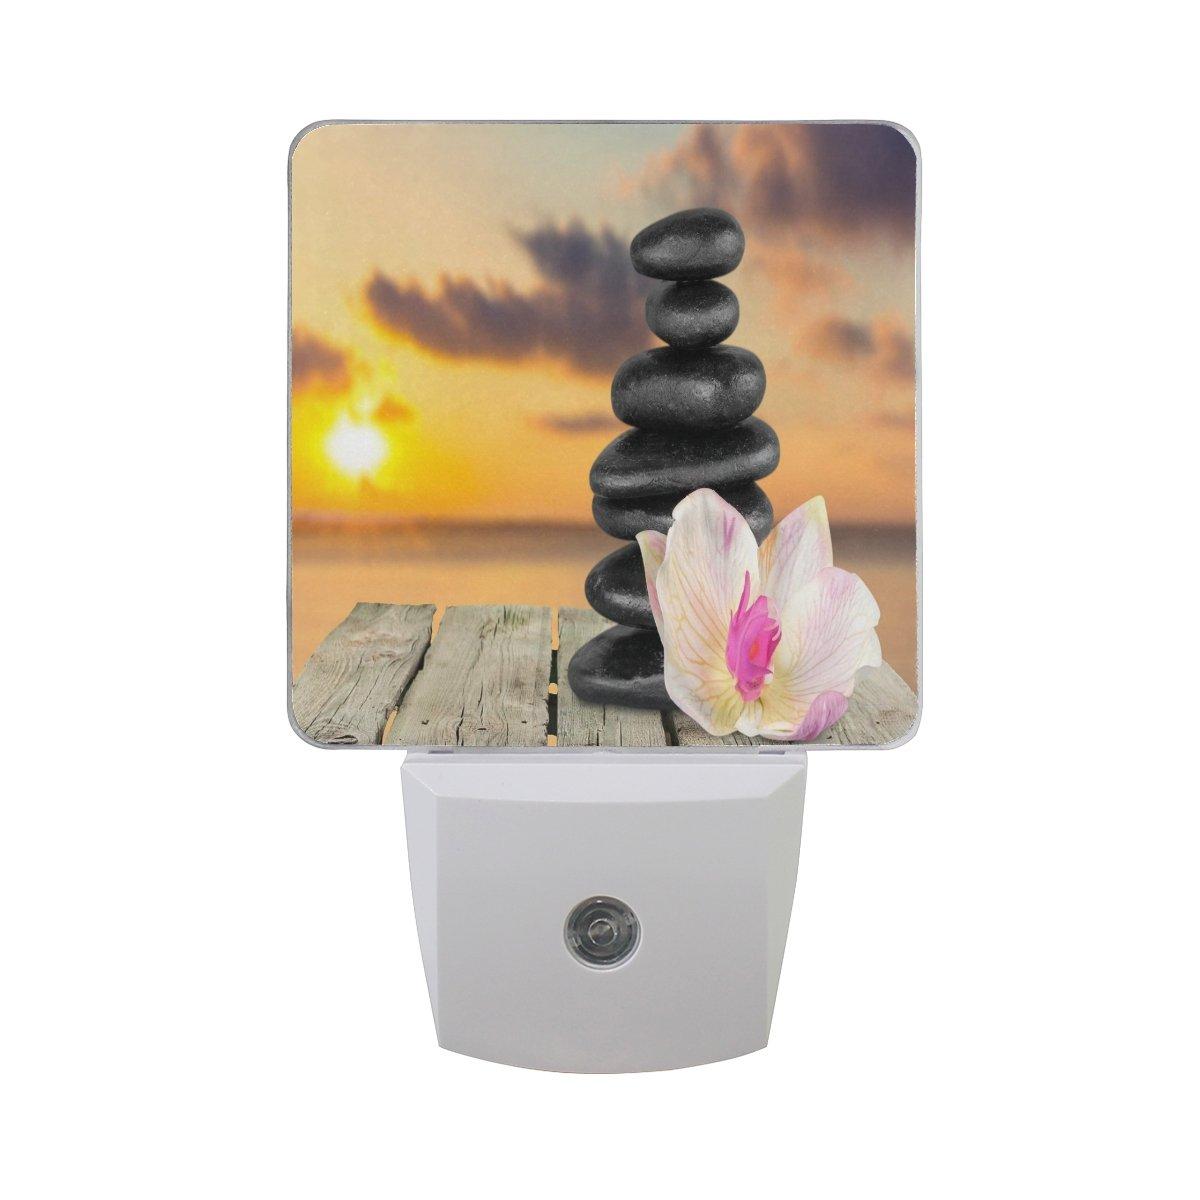 ALAZA Spa Floral Zen Stone Sunset Wooden LED Night Light Dusk to Dawn Sensor Plug in Night Home Decor Desk Lamp for Adult